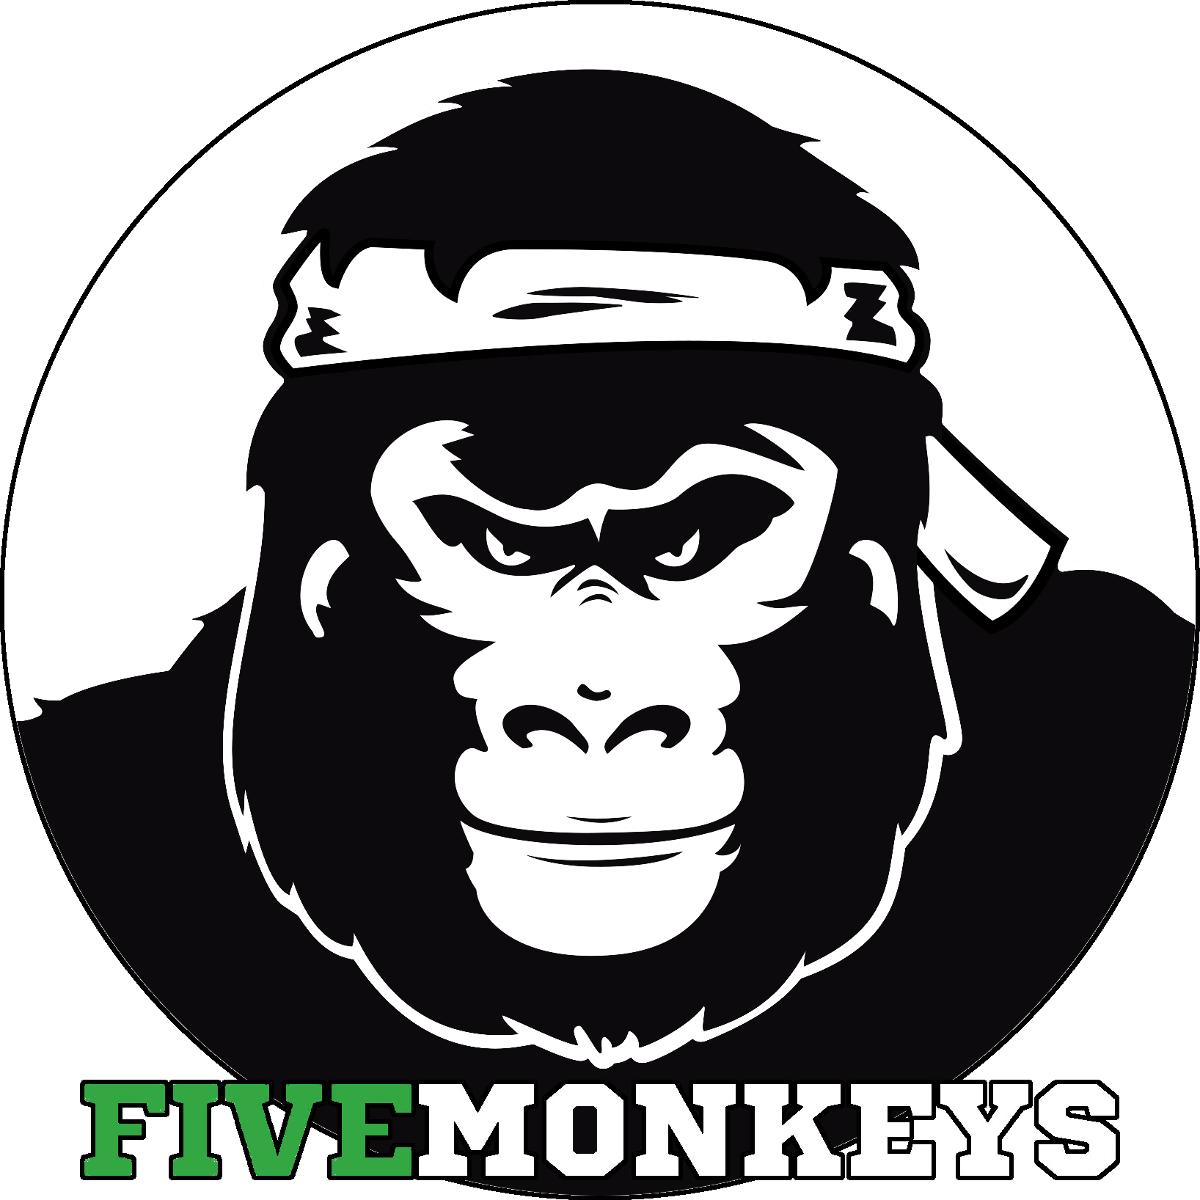 Five Monkeys - Kampfsport & Fitness am Kurfürstendamm in Berlin 1